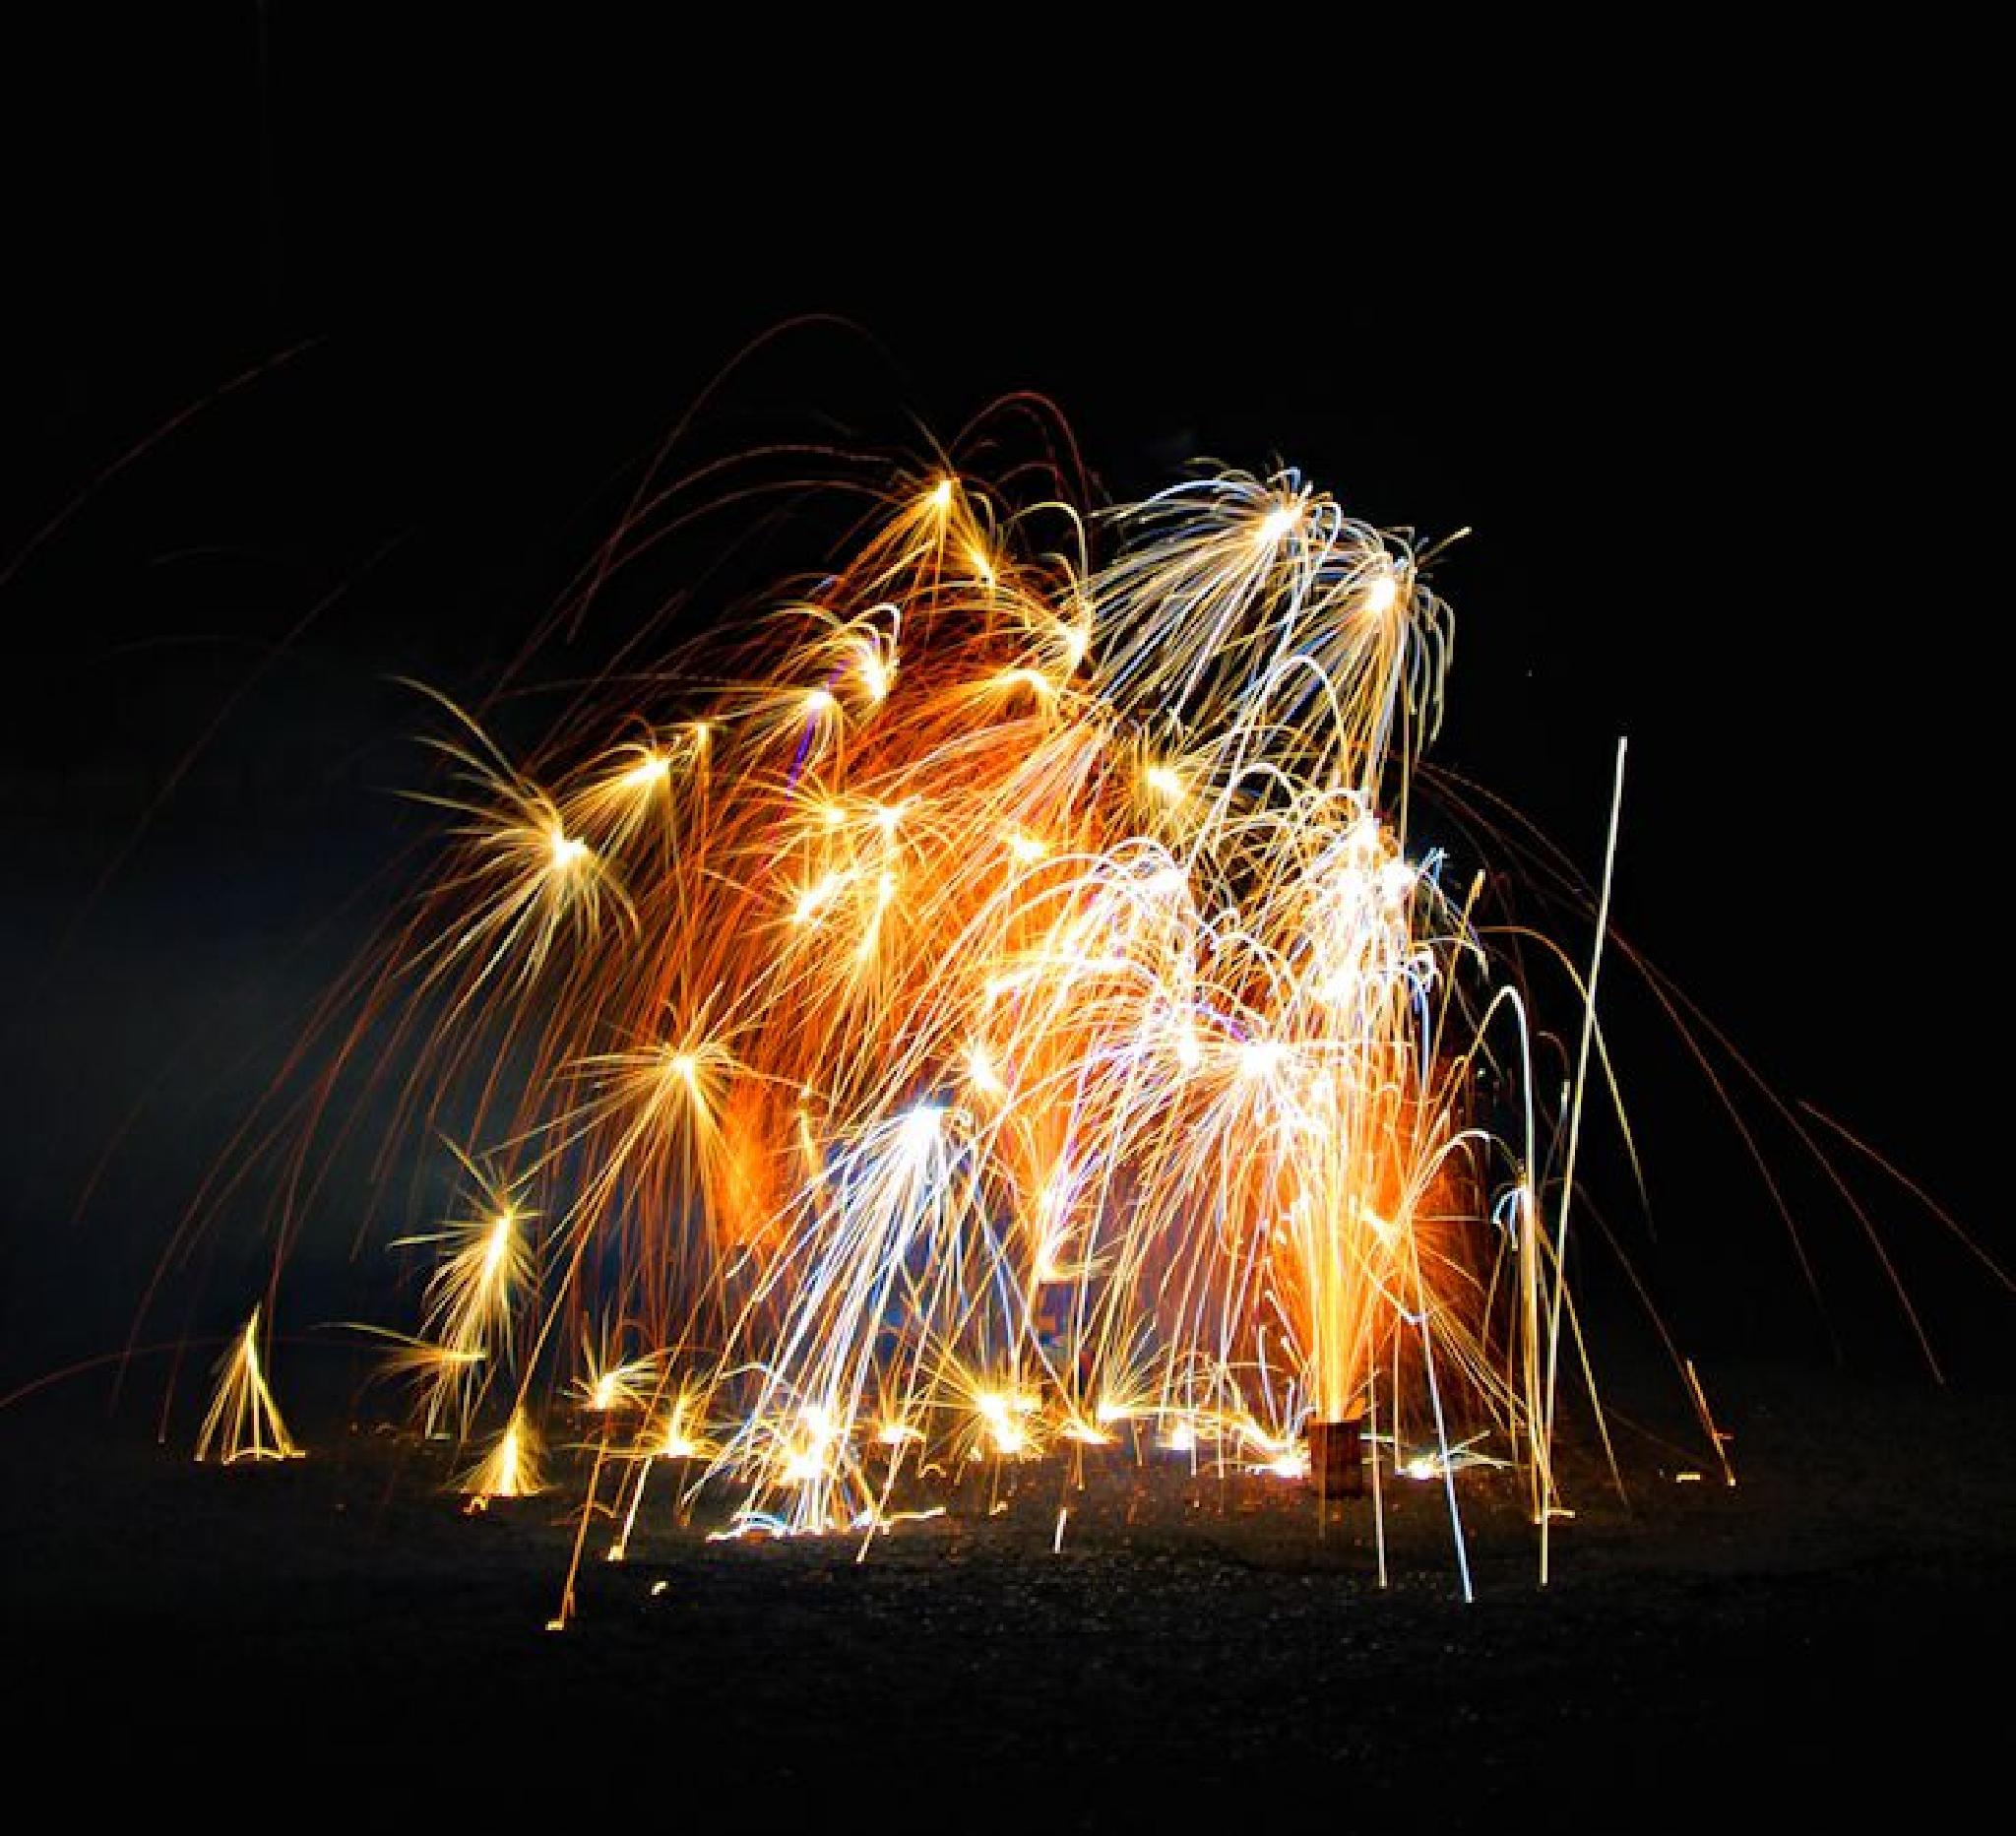 Street fireworks by Julie Gardner